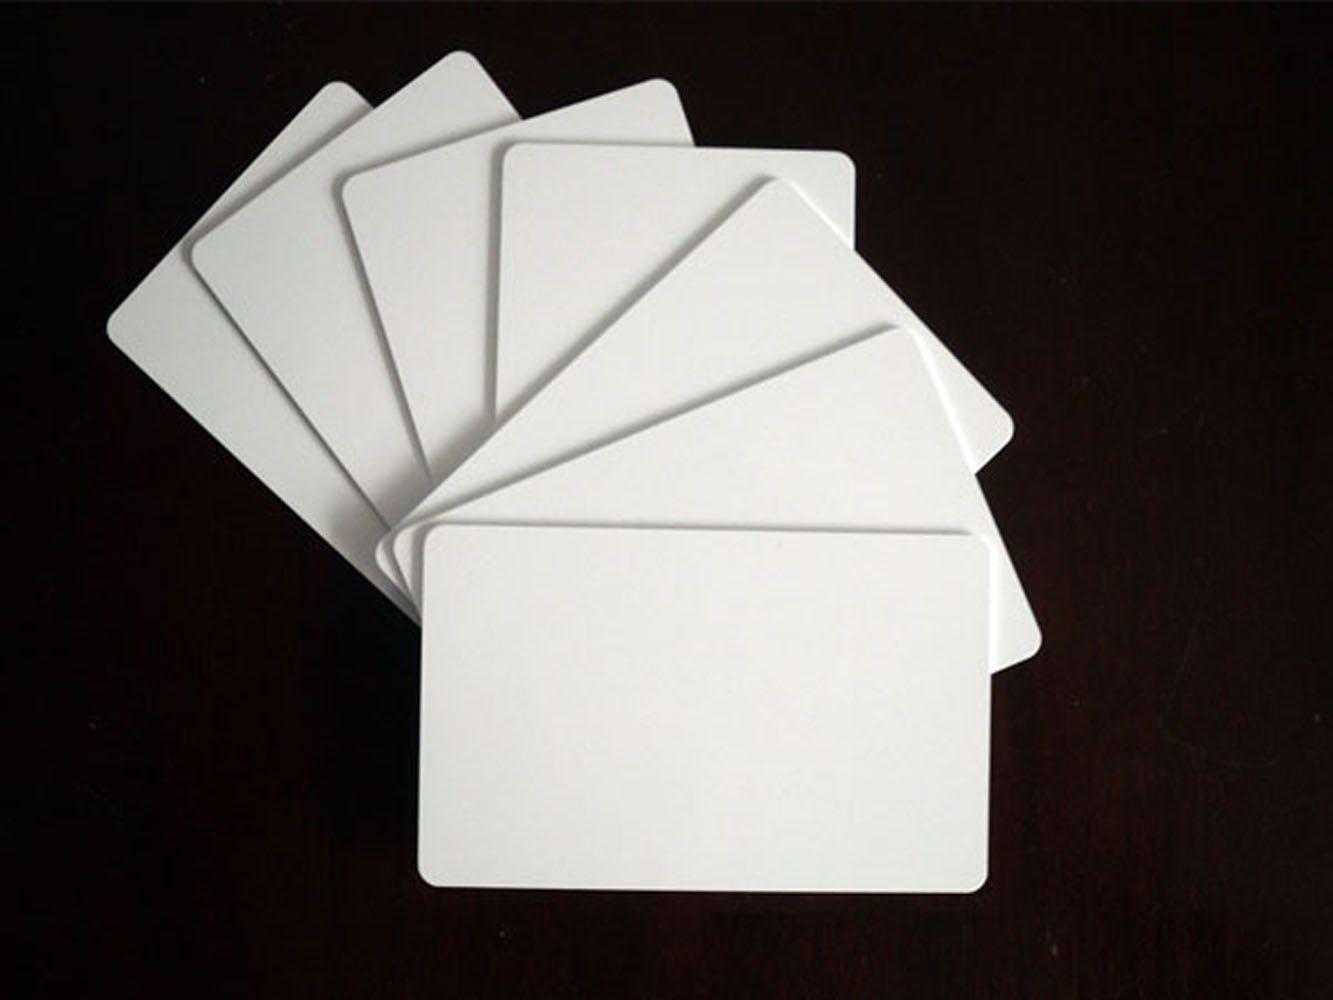 125kHz RFID Card 13.56MHz Proximity Card Blank Thin Card